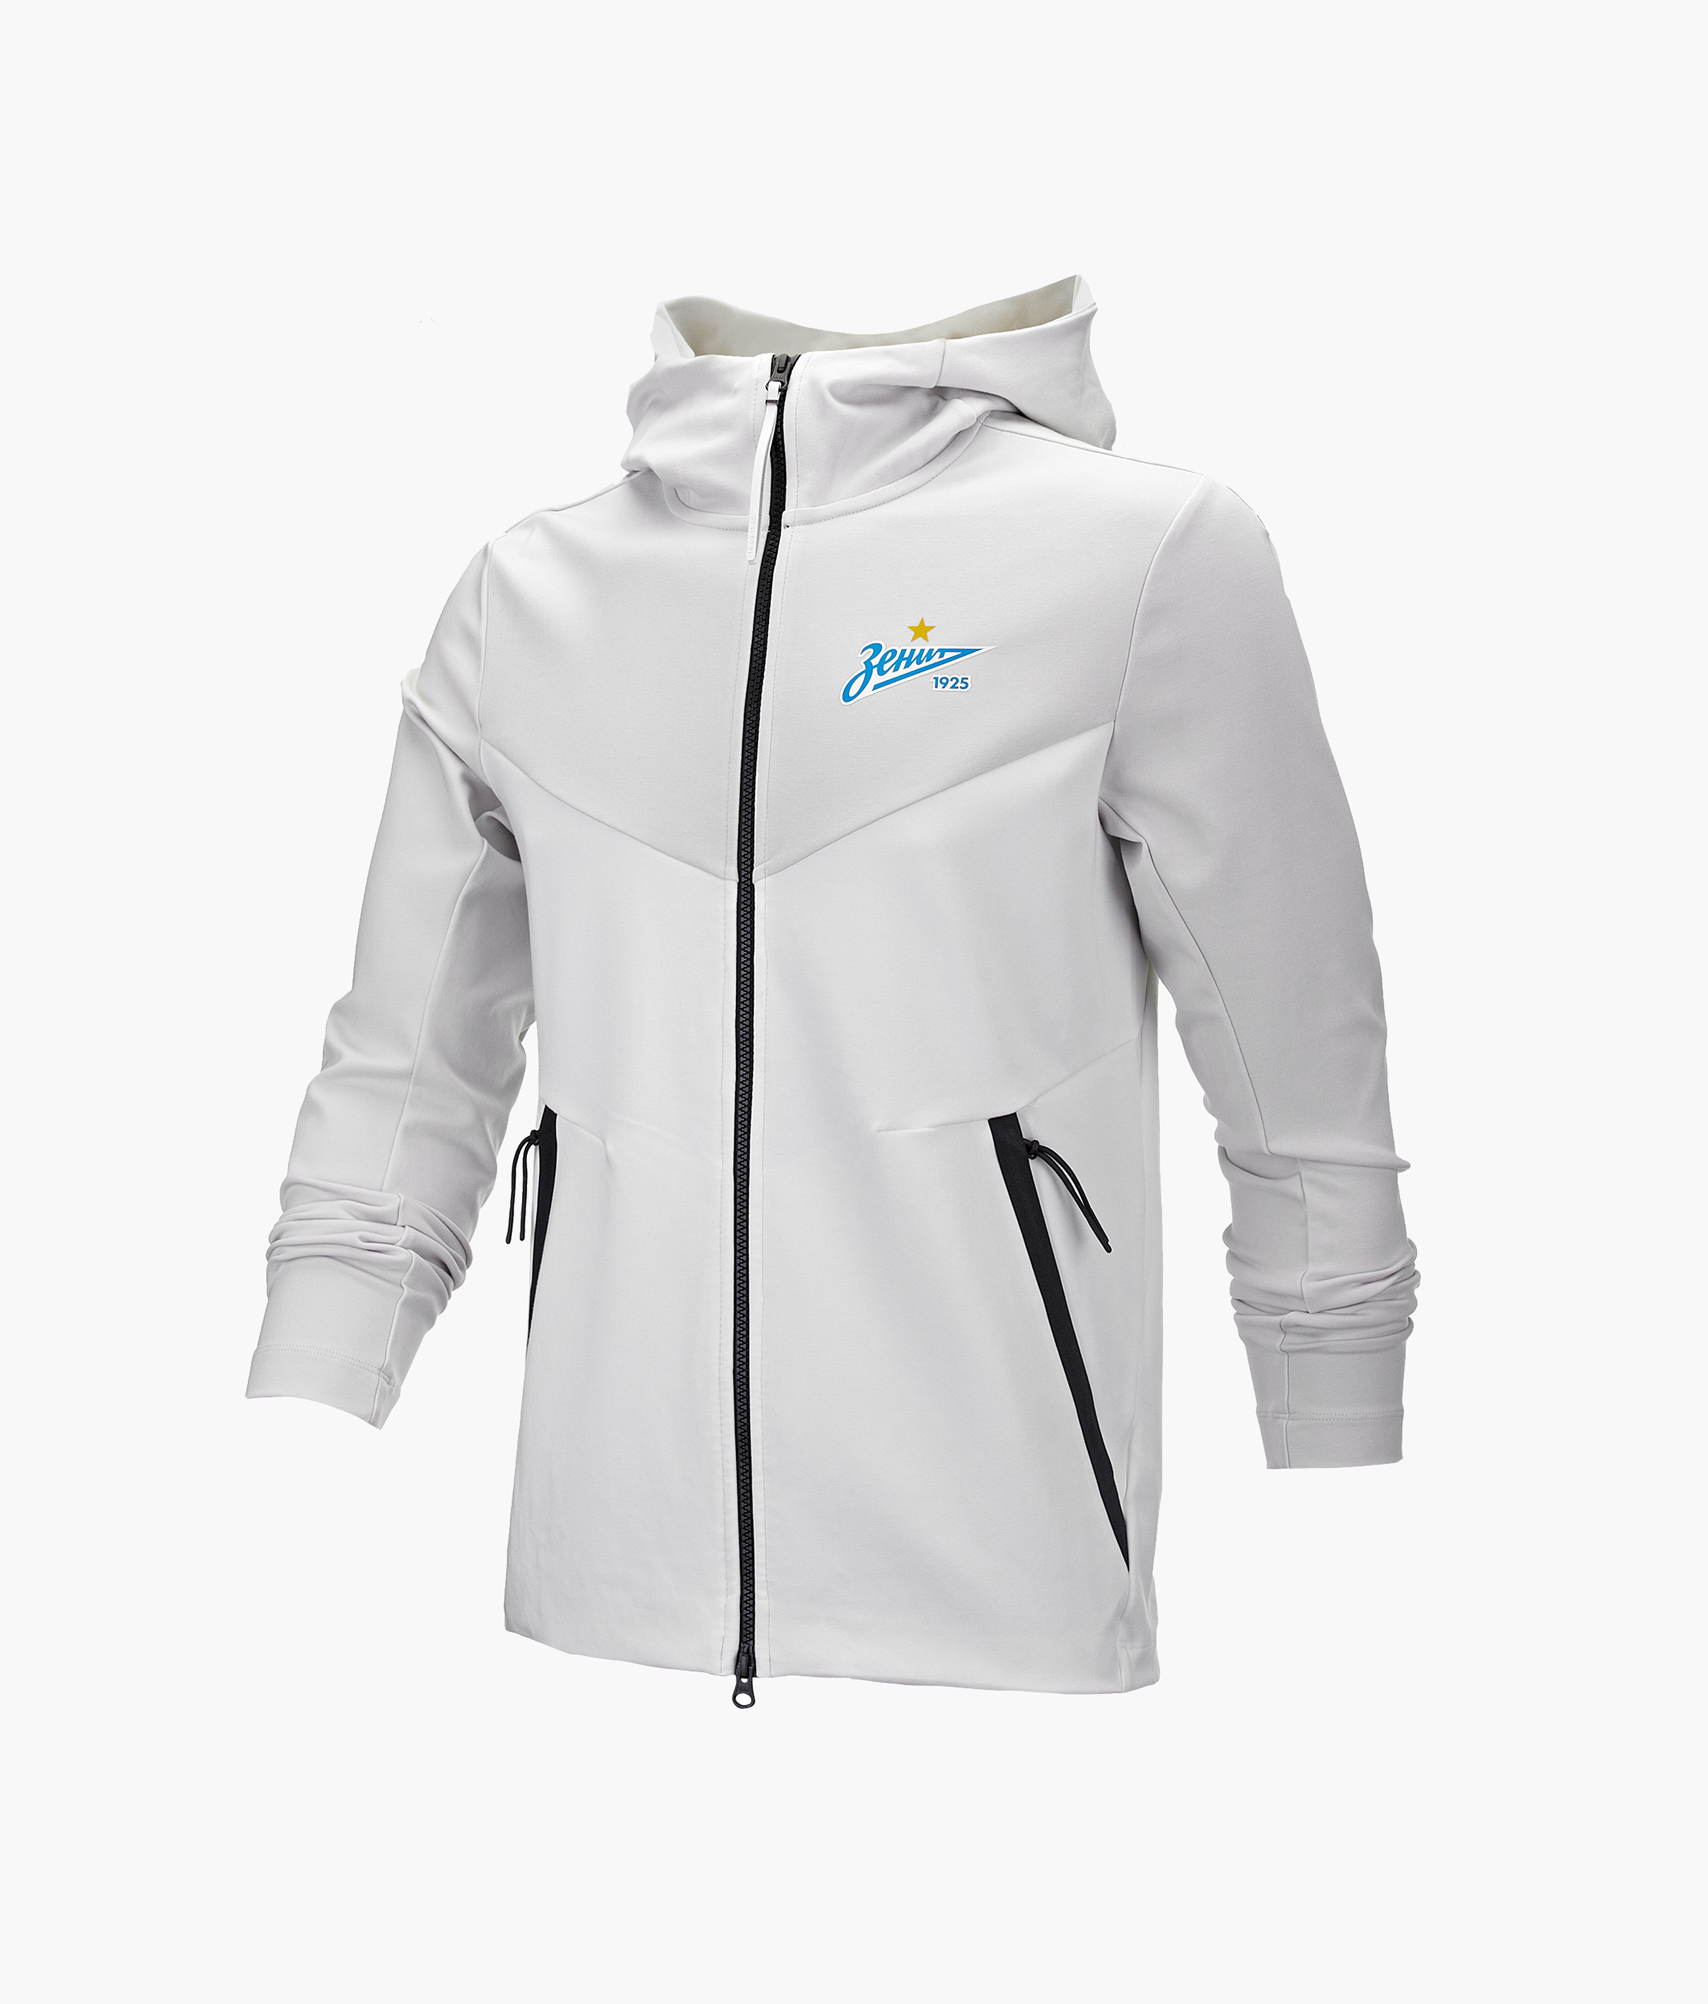 bc53b14a Толстовка Nike «Чемпион-2018/19» AR1548-072 купить за 9 350 руб в интернет  магазине ФК Зенит